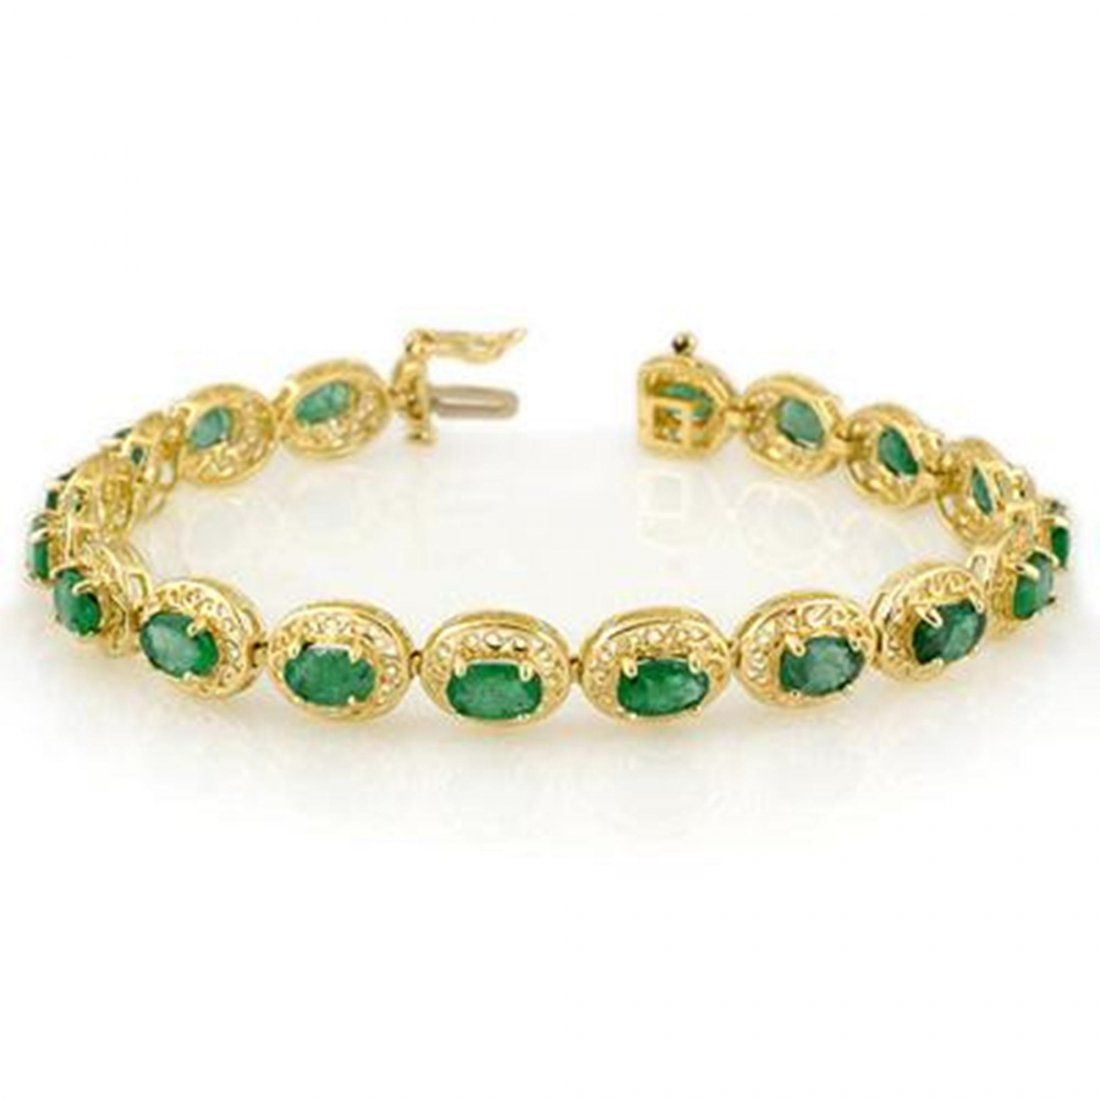 251J: Genuine 10.0 ctw Emerald Bracelet 10K Yellow Gold